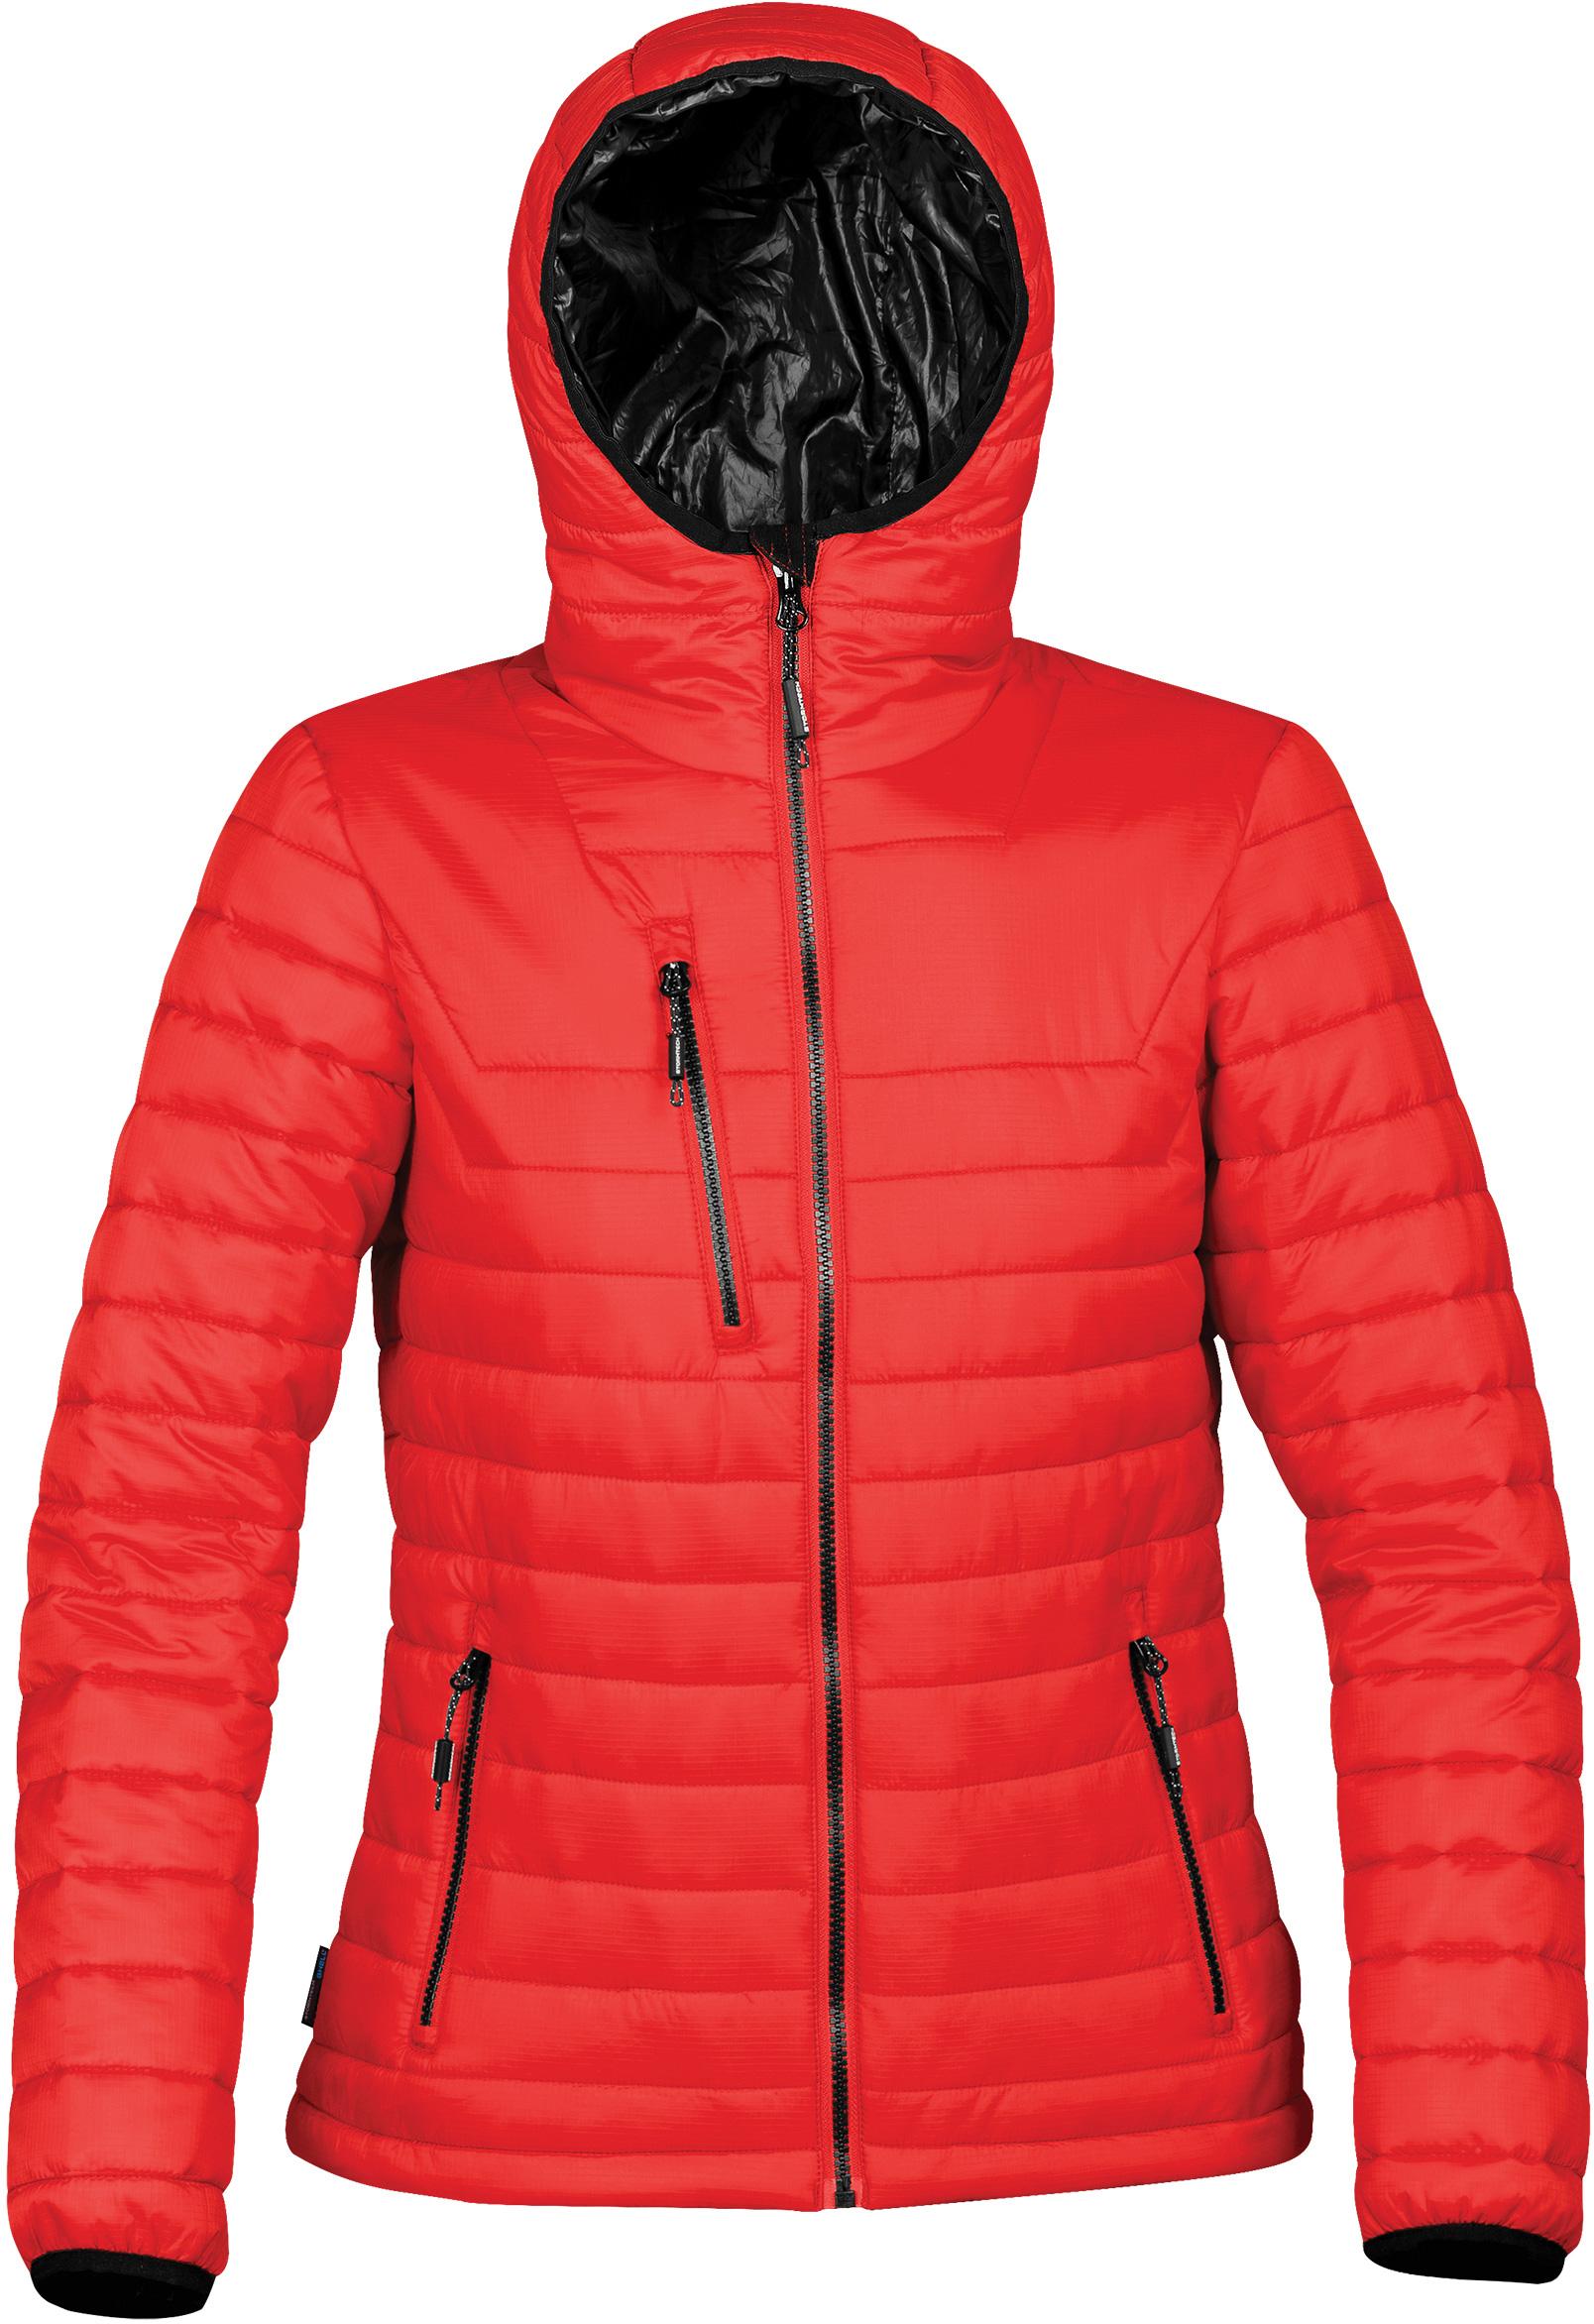 Stormtech AFP-1W - Women's Gravity Thermal Jacket